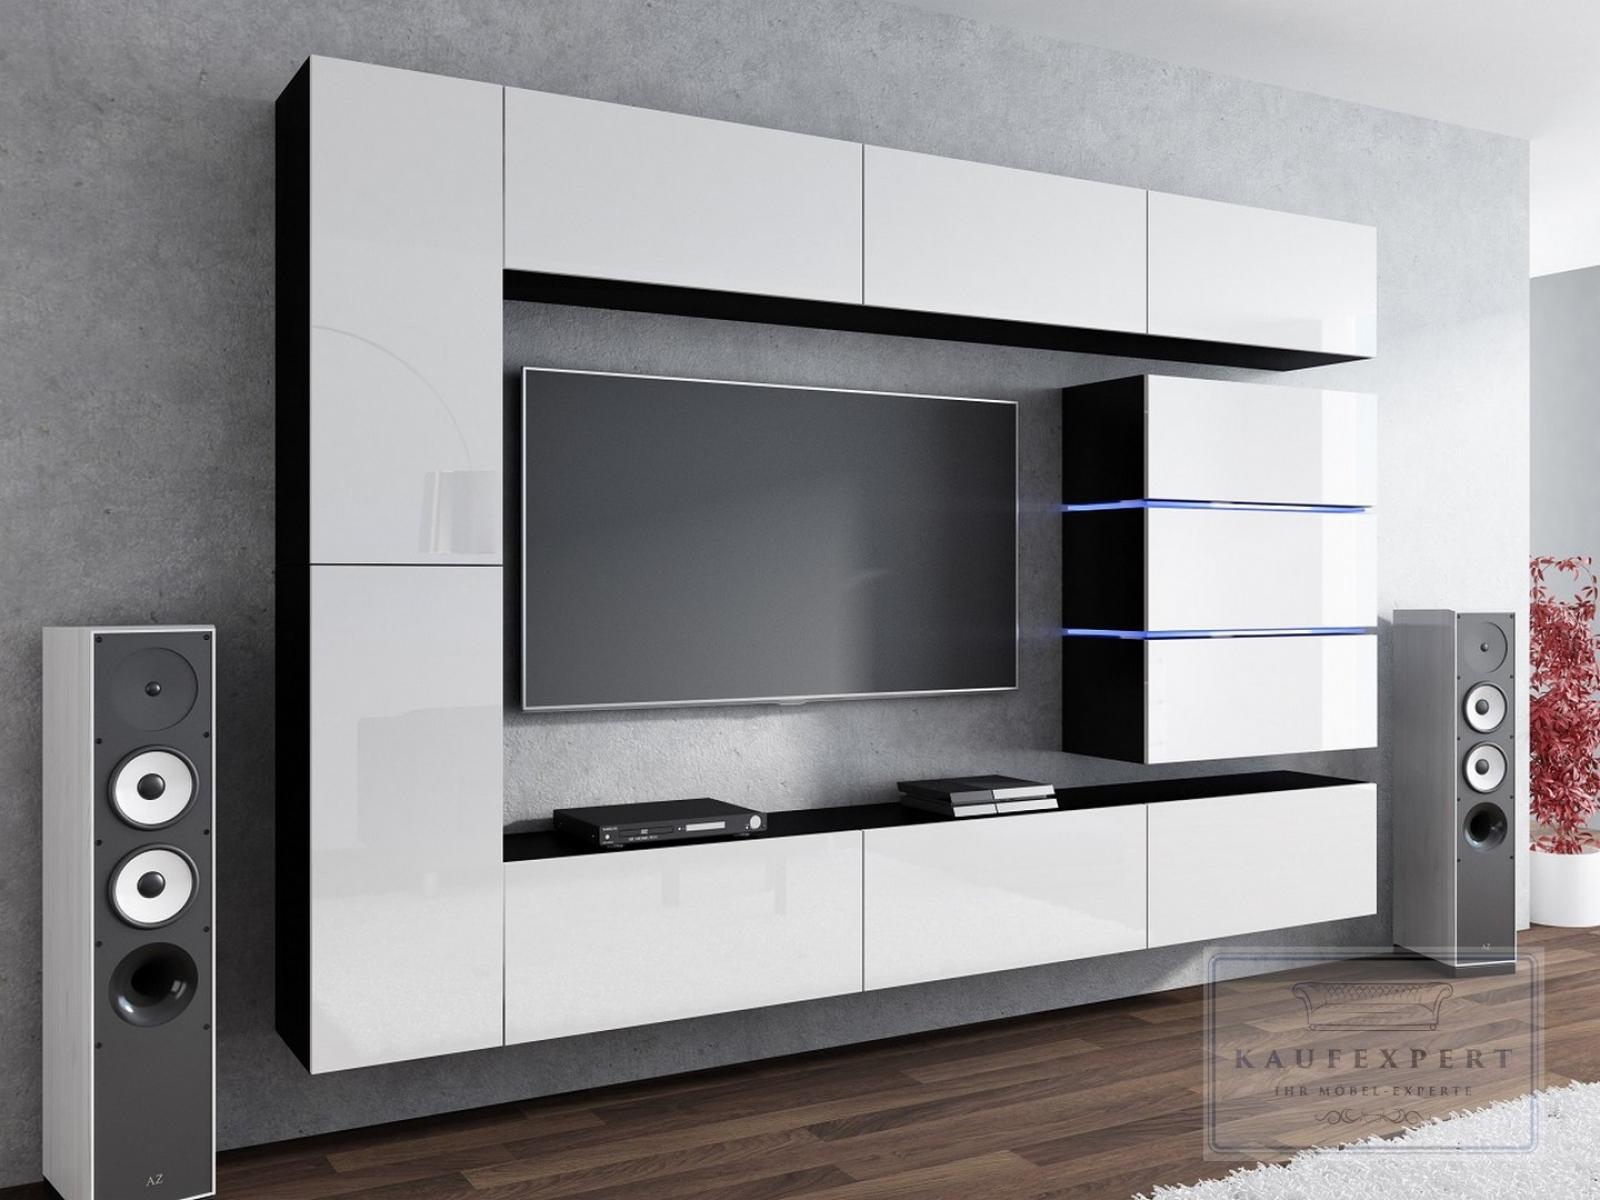 Wohnwand Shine Weiß Hochglanz Schwarz 284 Cm Mediawand Medienwand Design Modern Led Beleuchtung Mdf Hochglanz Hängewand Hängeschrank Tv Wand